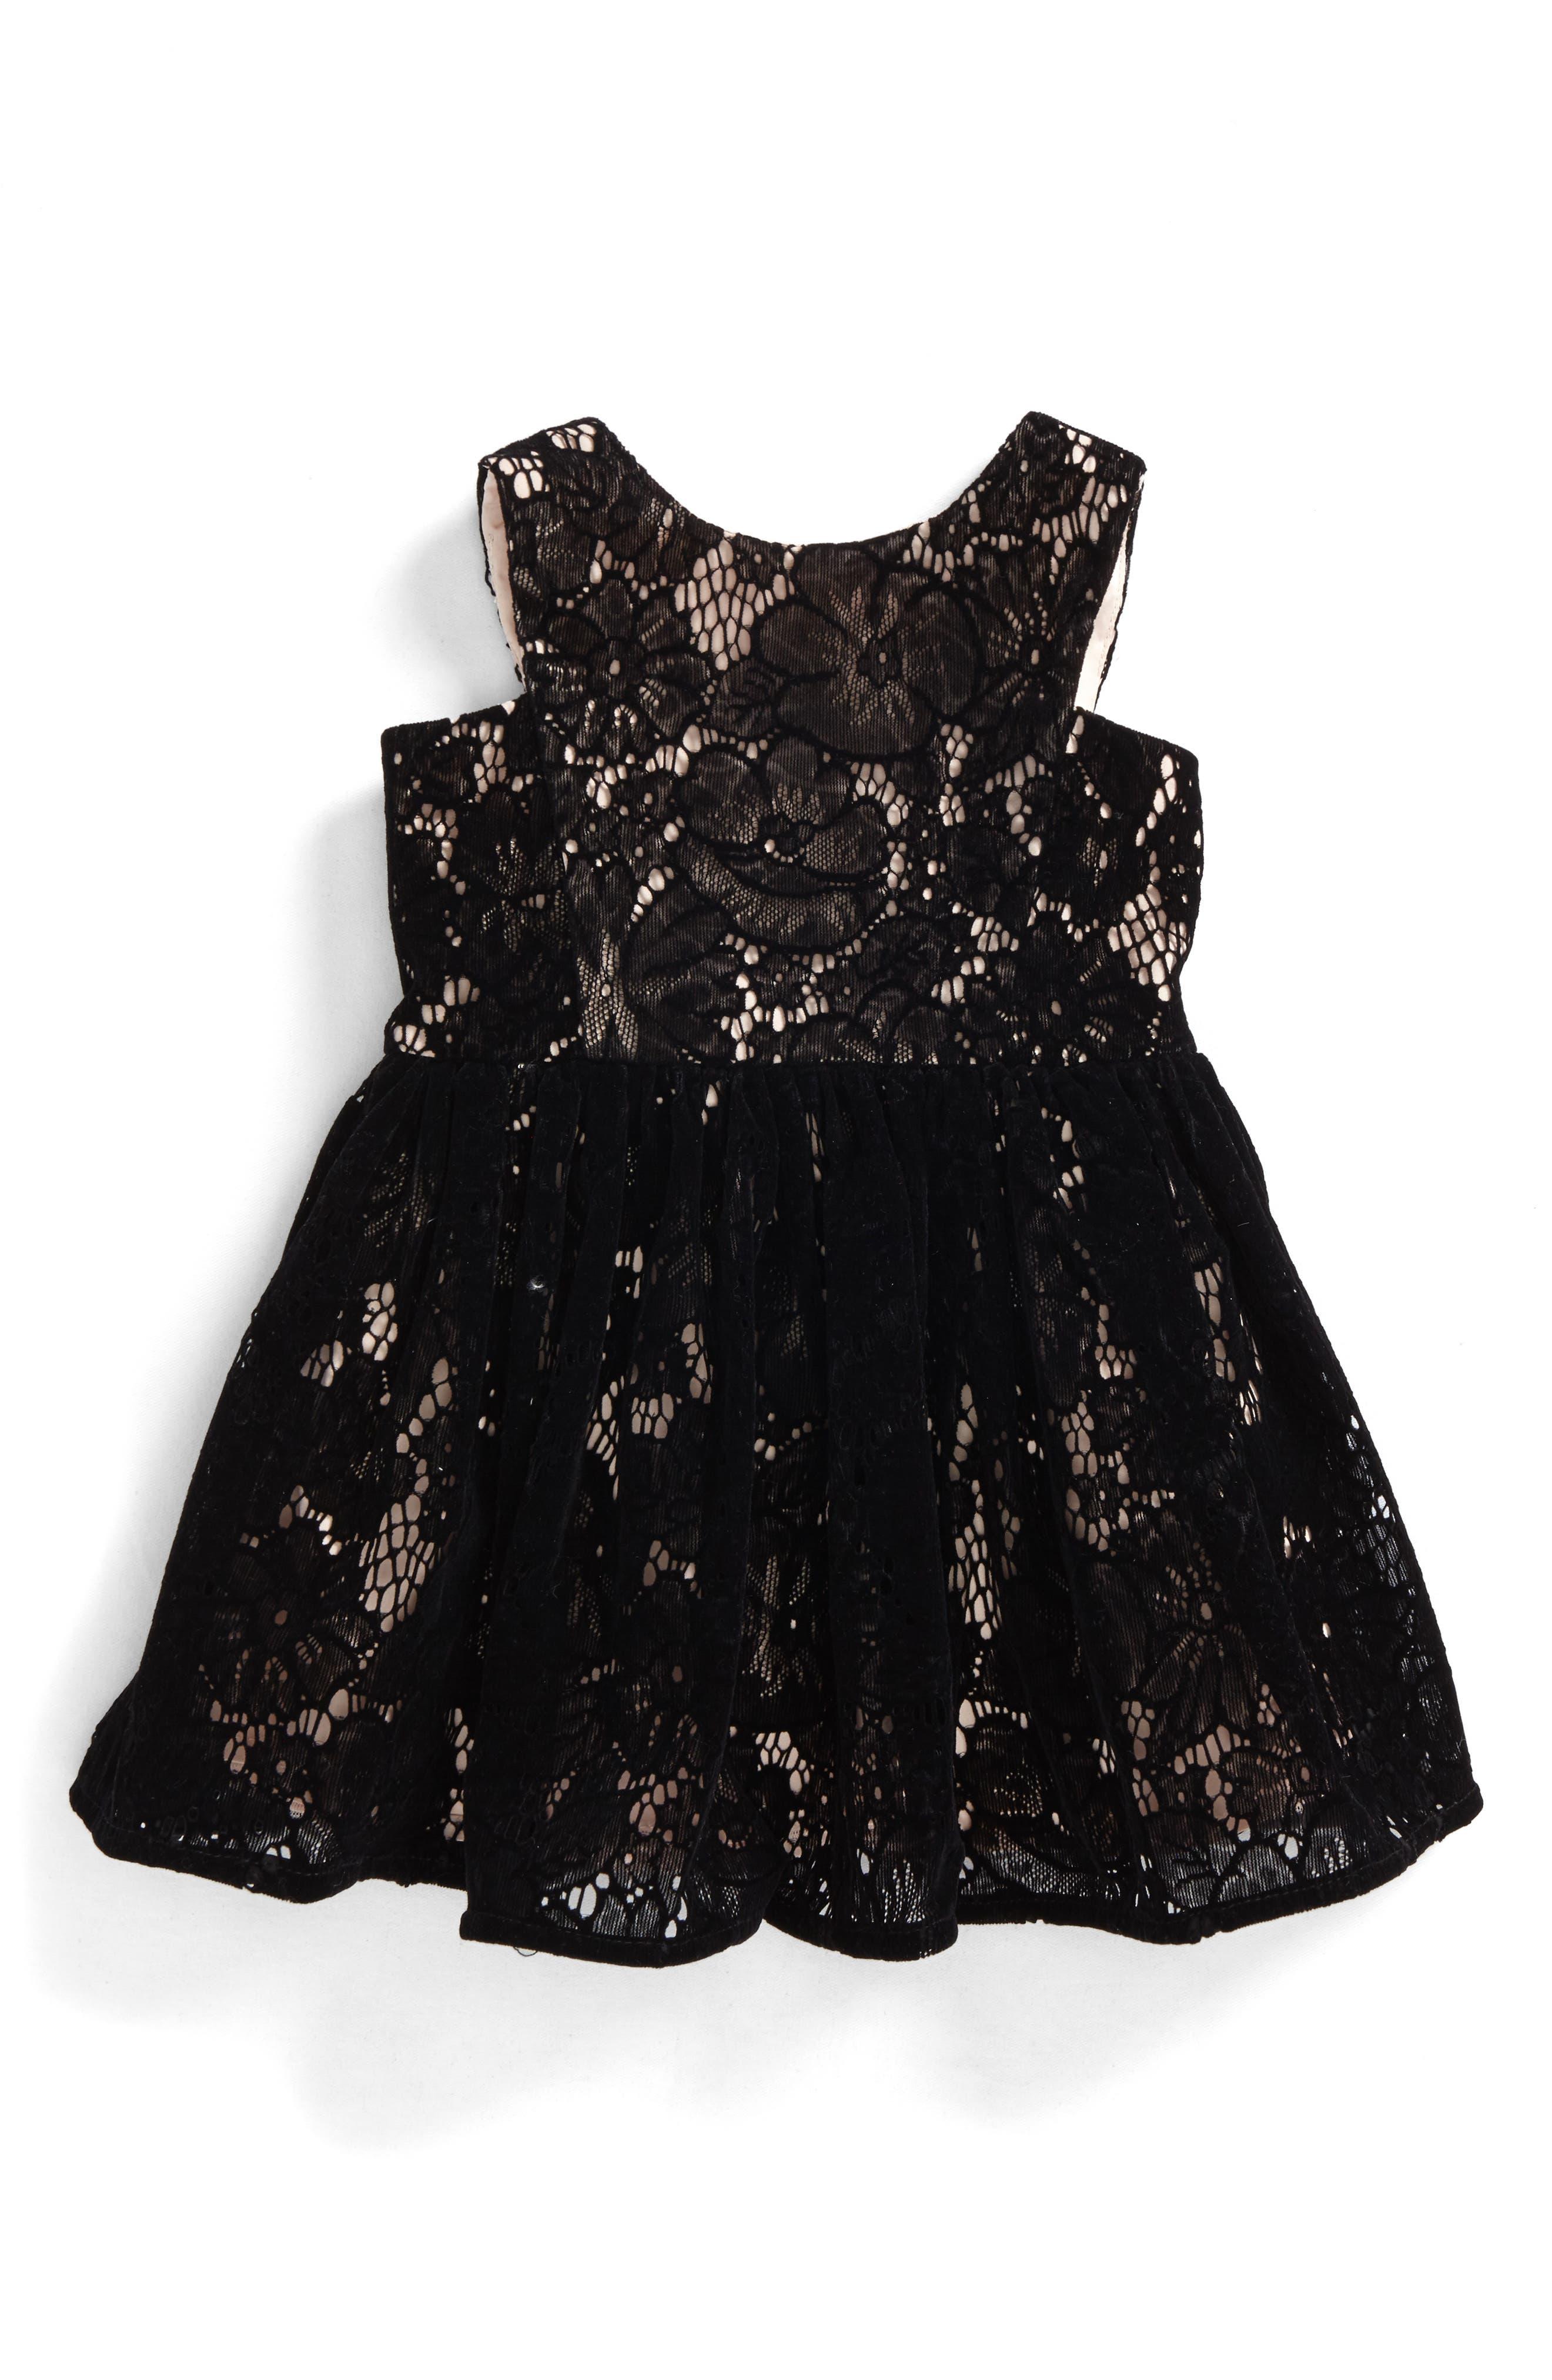 Alternate Image 1 Selected - Bardot Junior Flocked Lace Dress (Baby Girls & Toddler Girls)